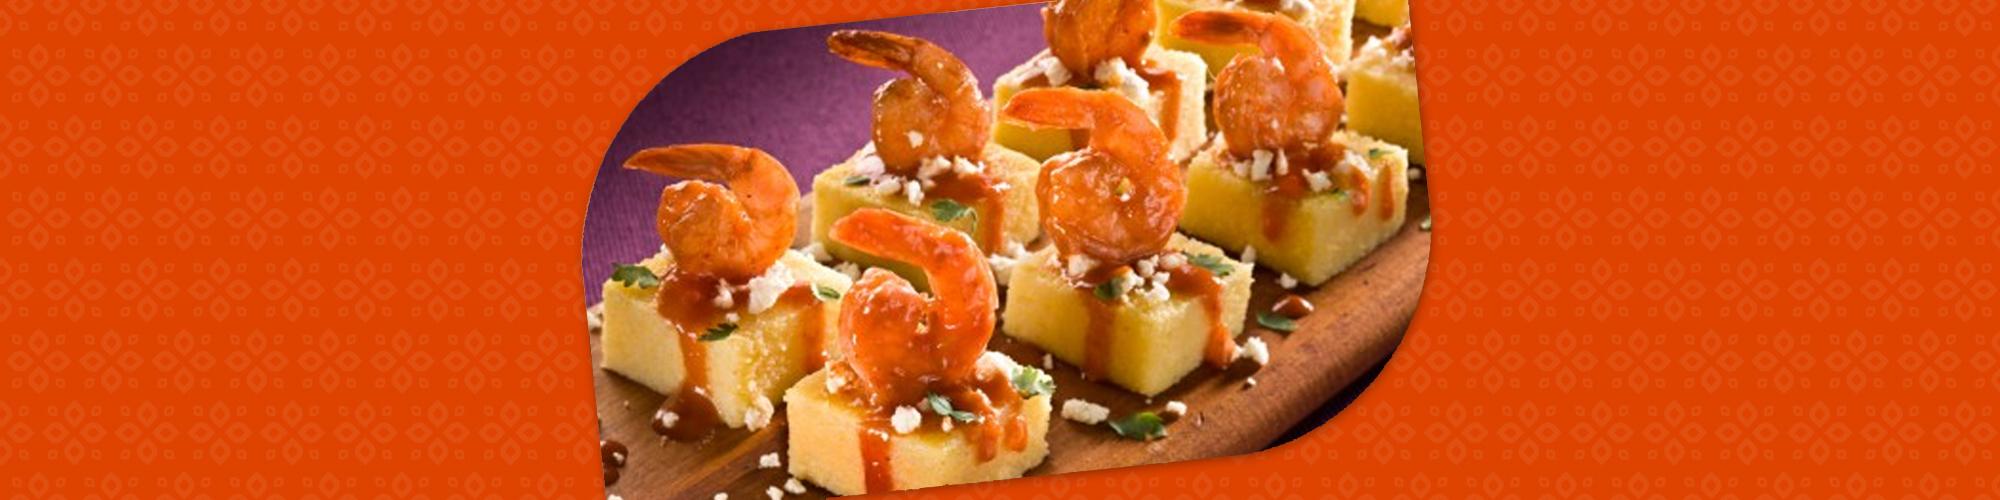 Salsas shrimp enchilada bites on polenta squares